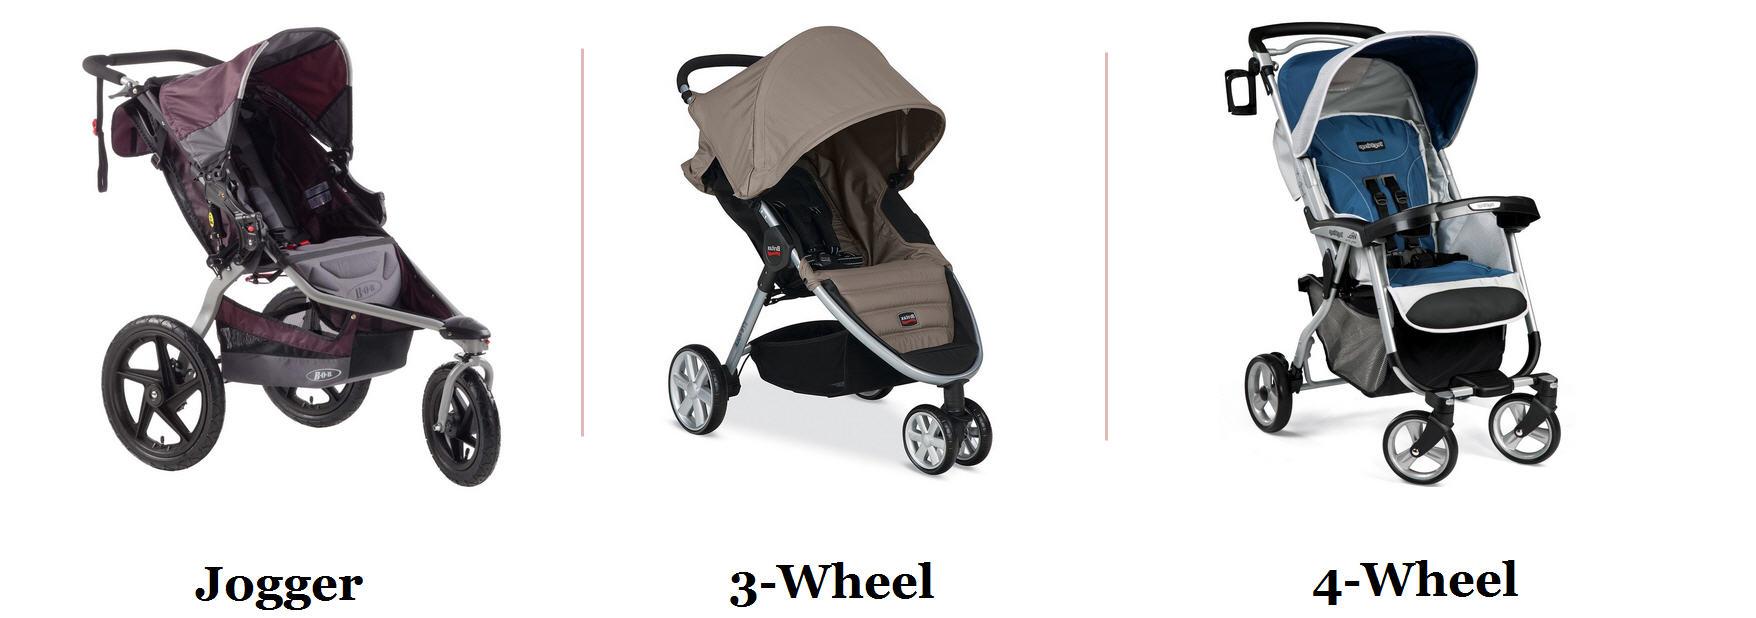 Best-Baby-Travel-System-2